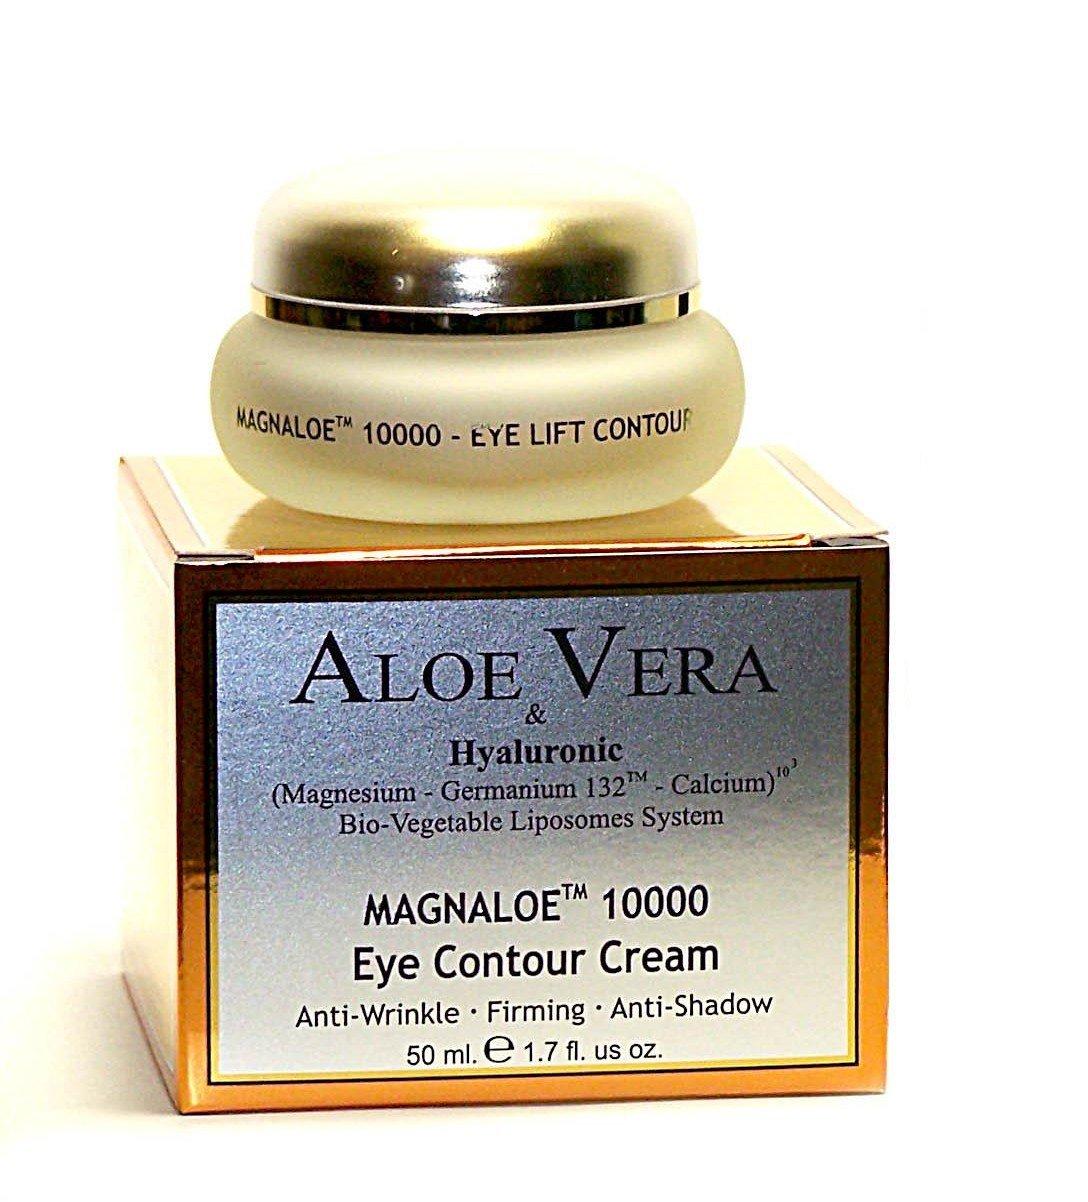 Canarias Cosmetics Magnaloe 10000 Eye Contour Cream, 1er Pack (1 x 50 g) 210134